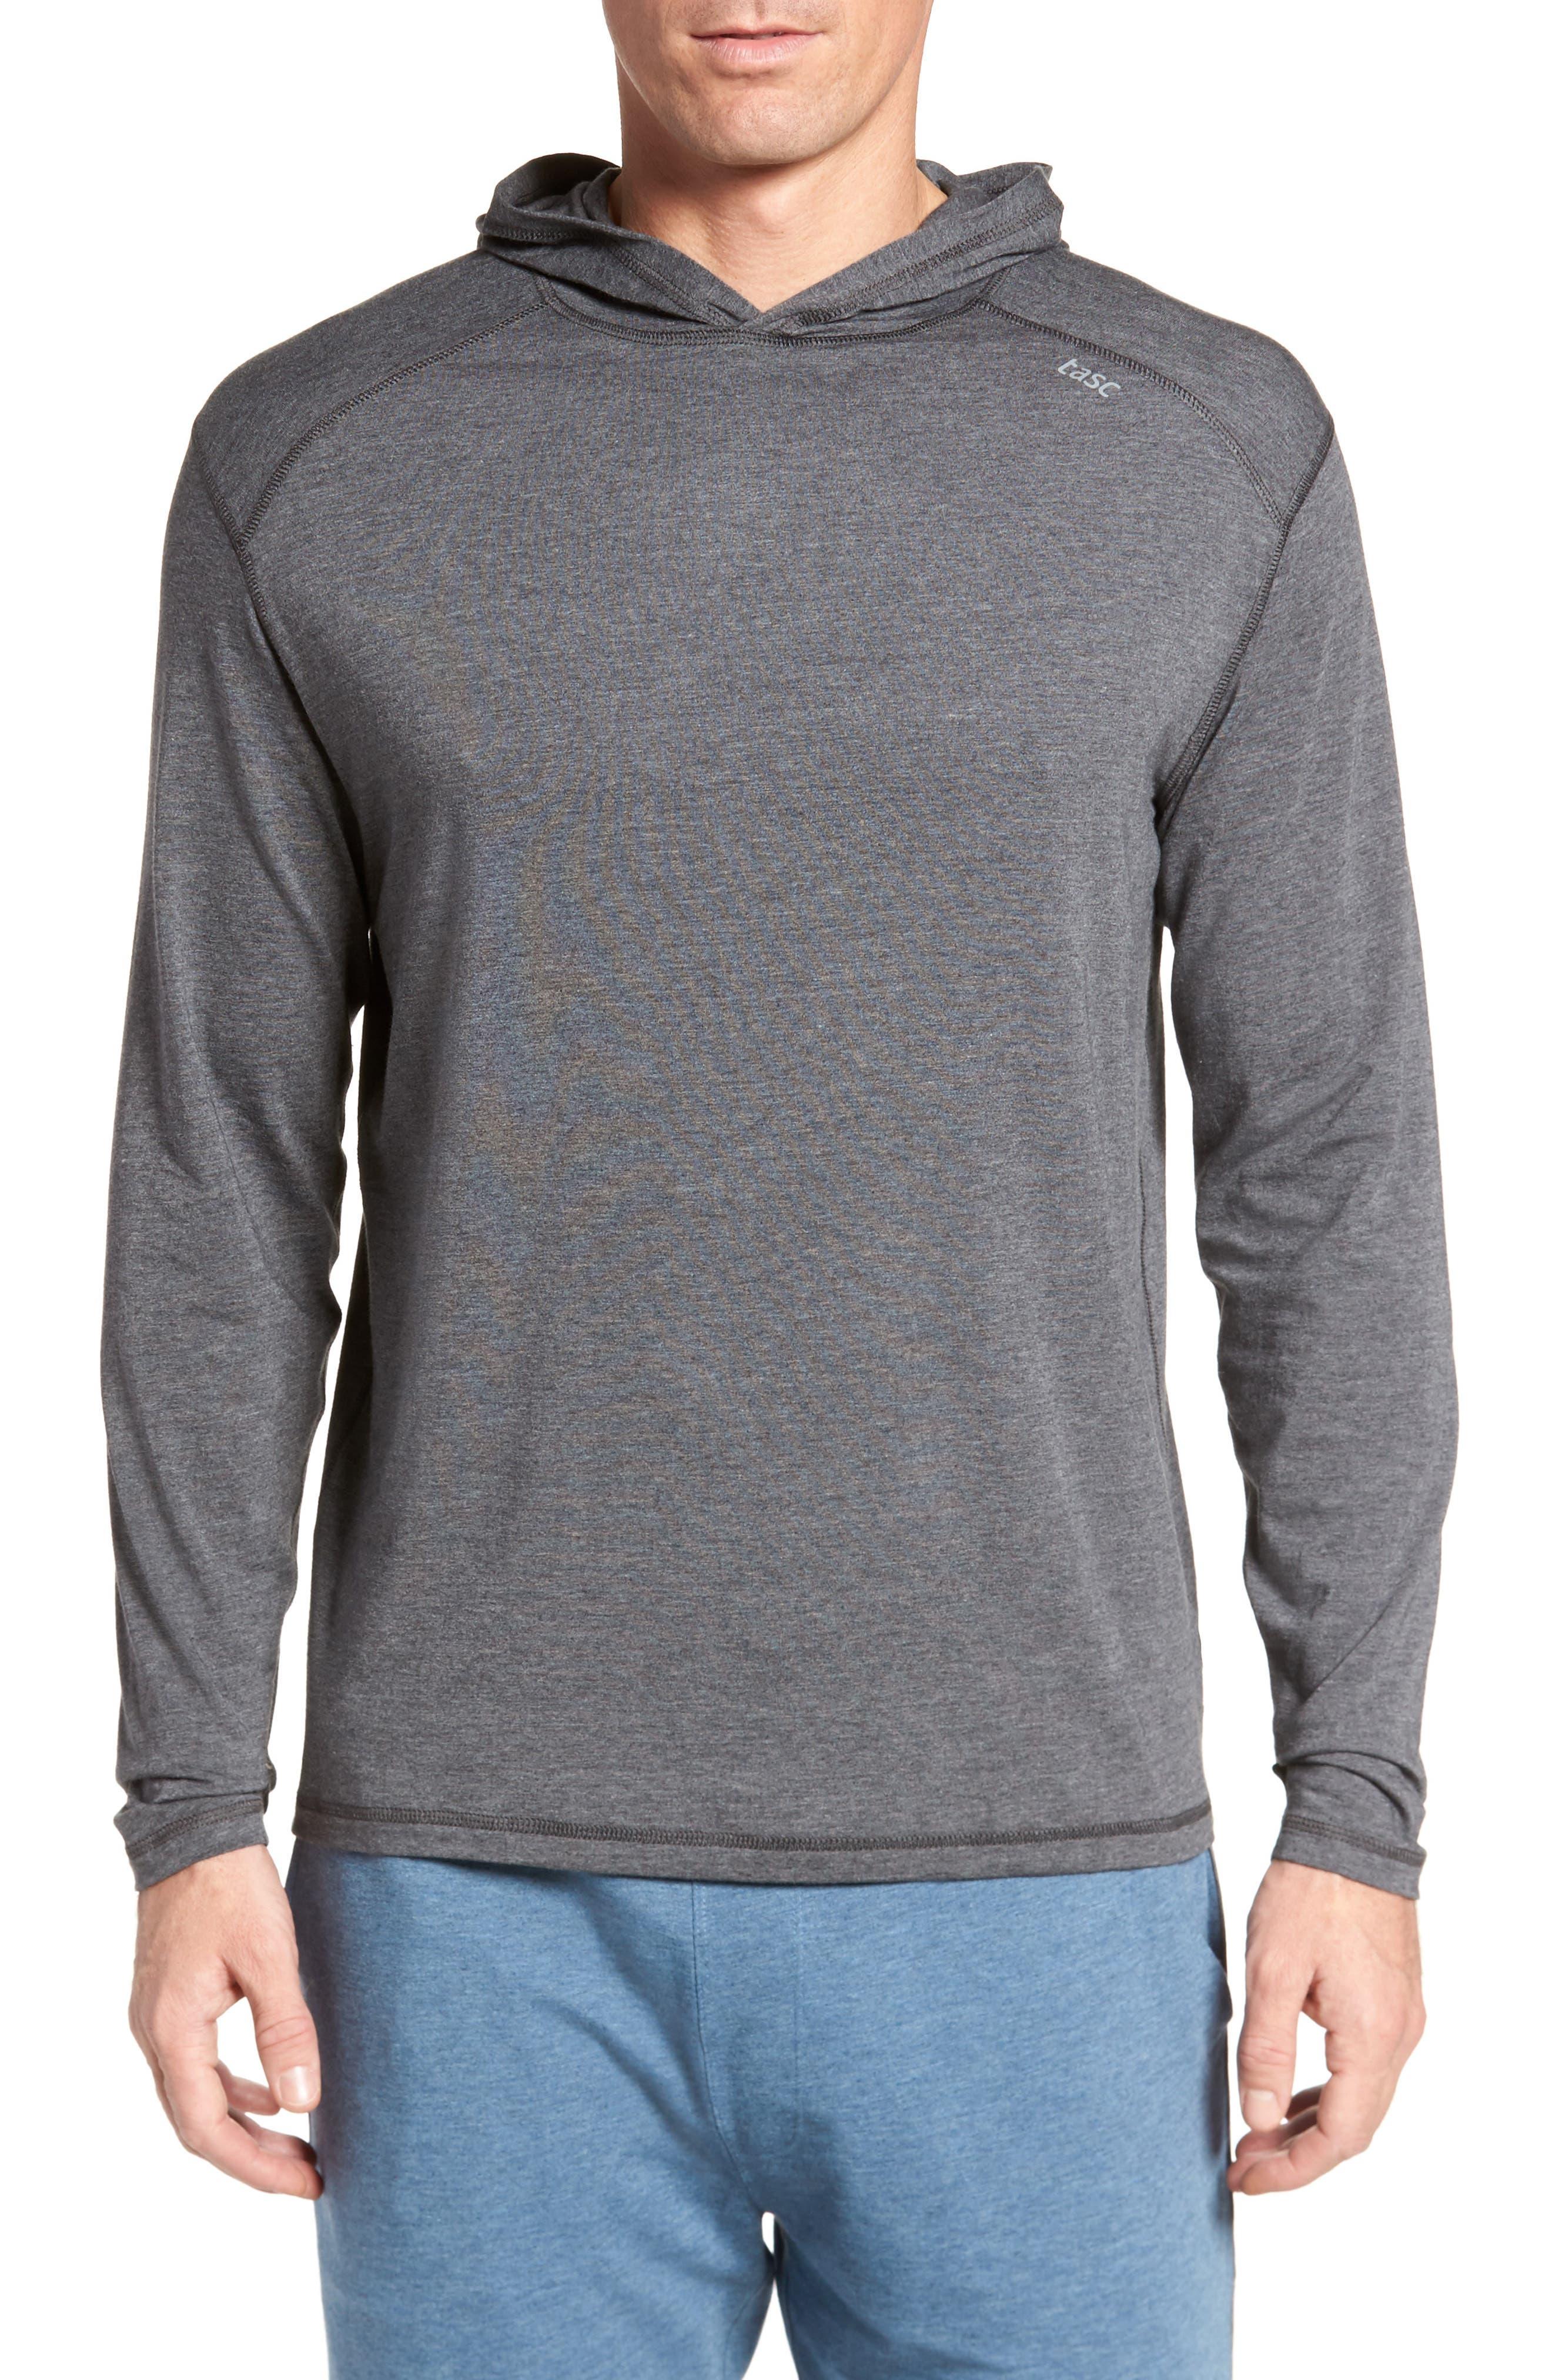 Main Image - tasc Performance Carrollton Regular Fit Pullover Hoodie